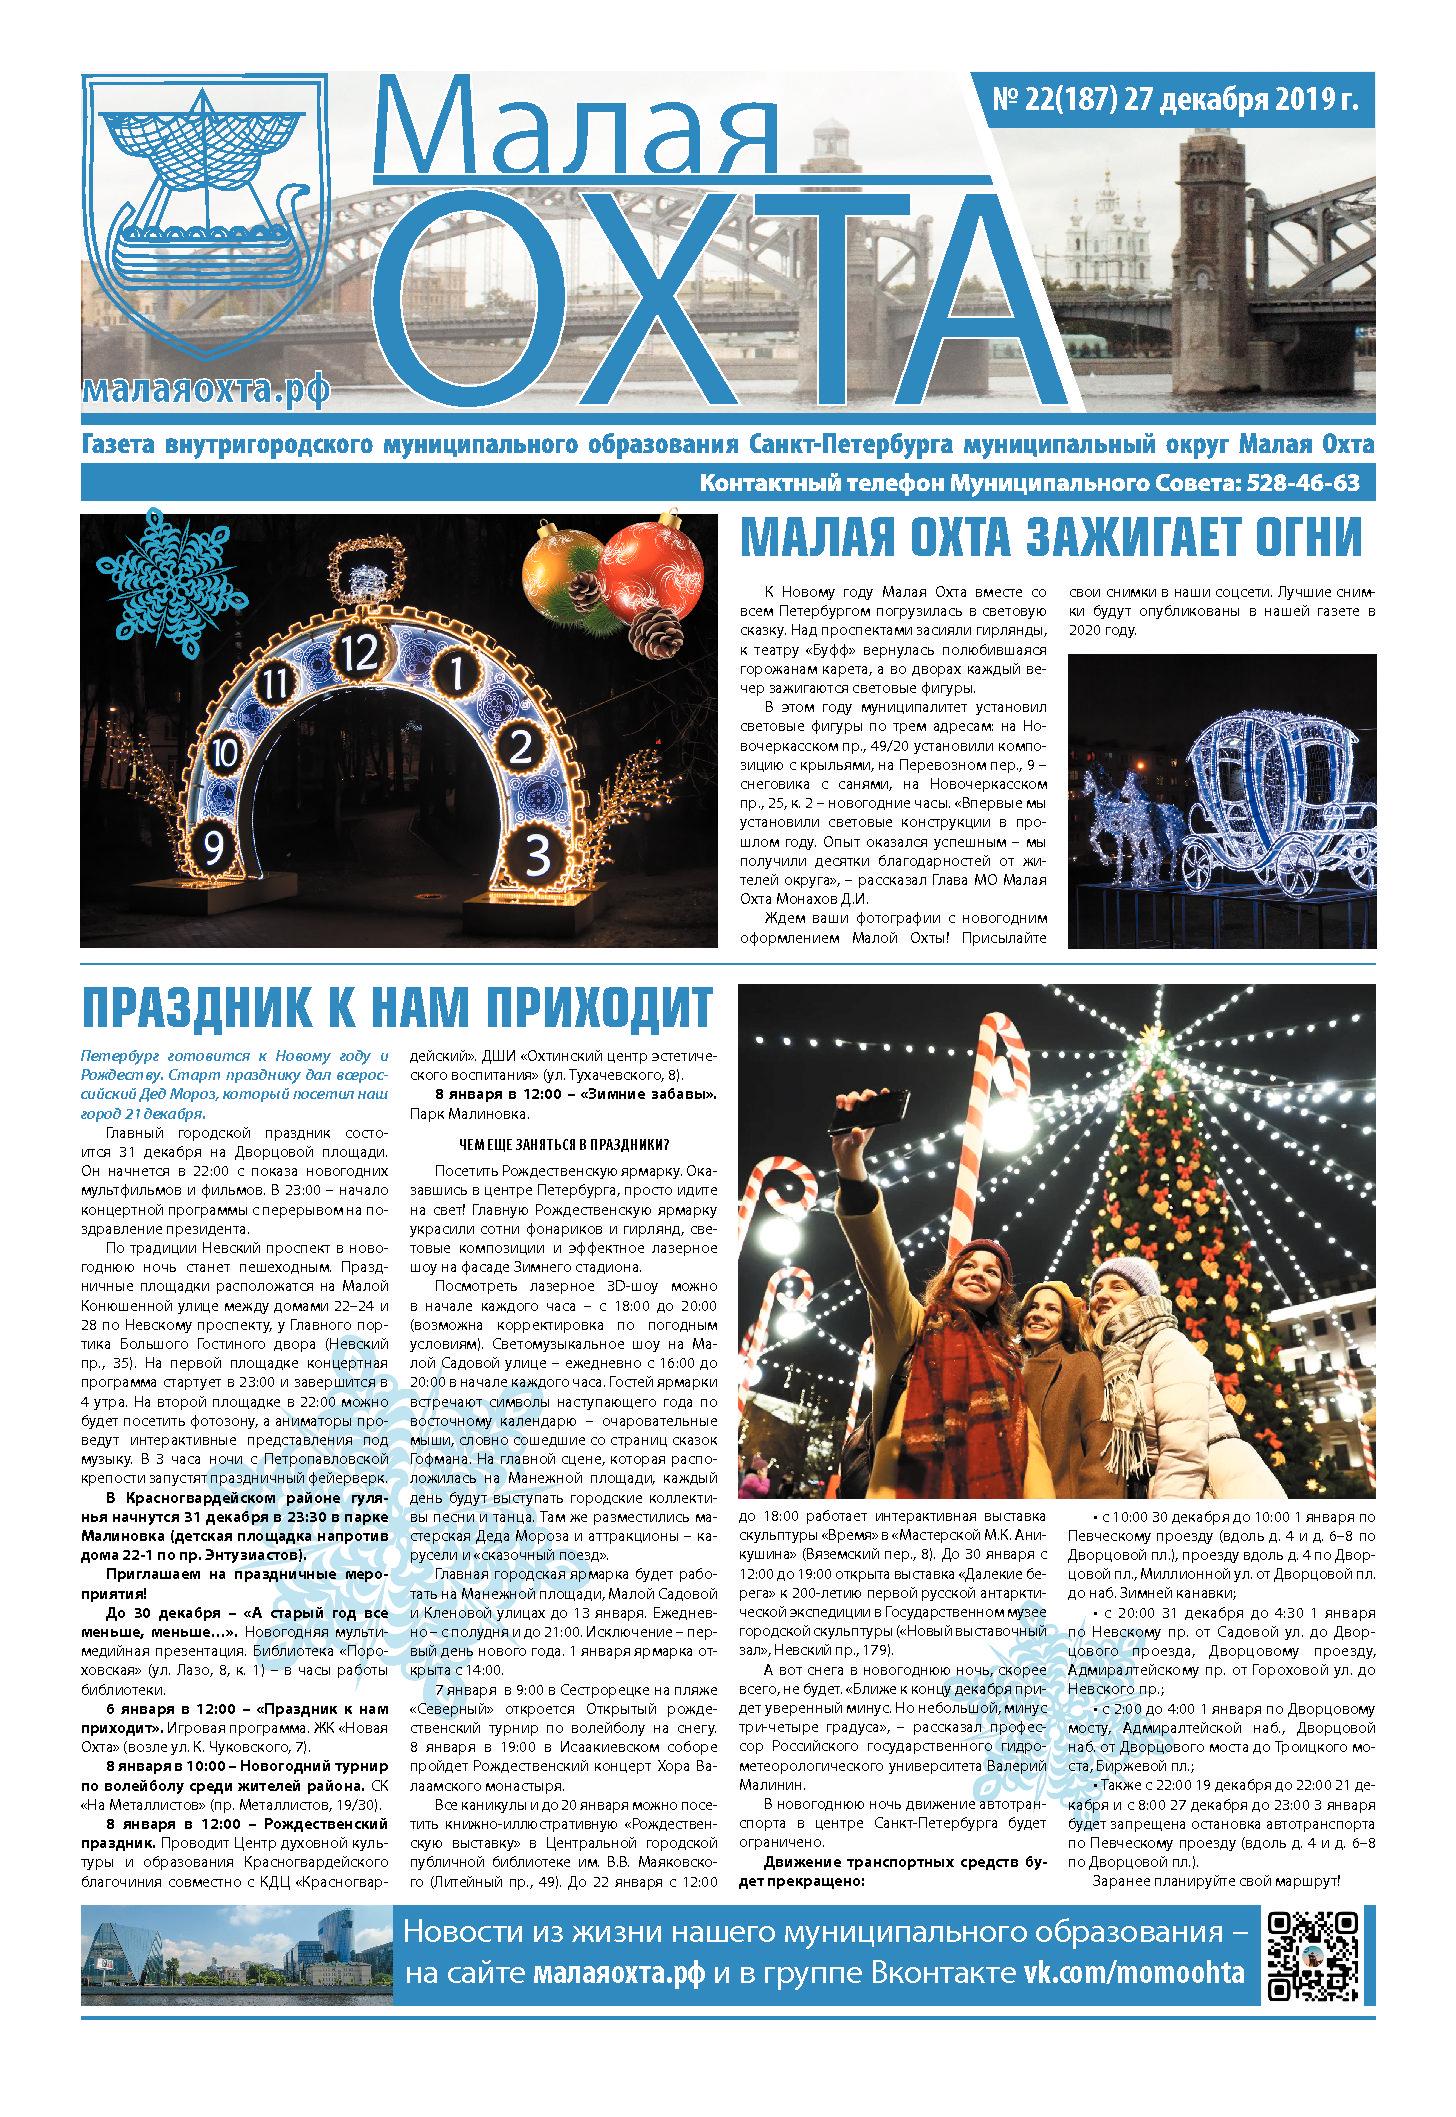 Газета №22 2019